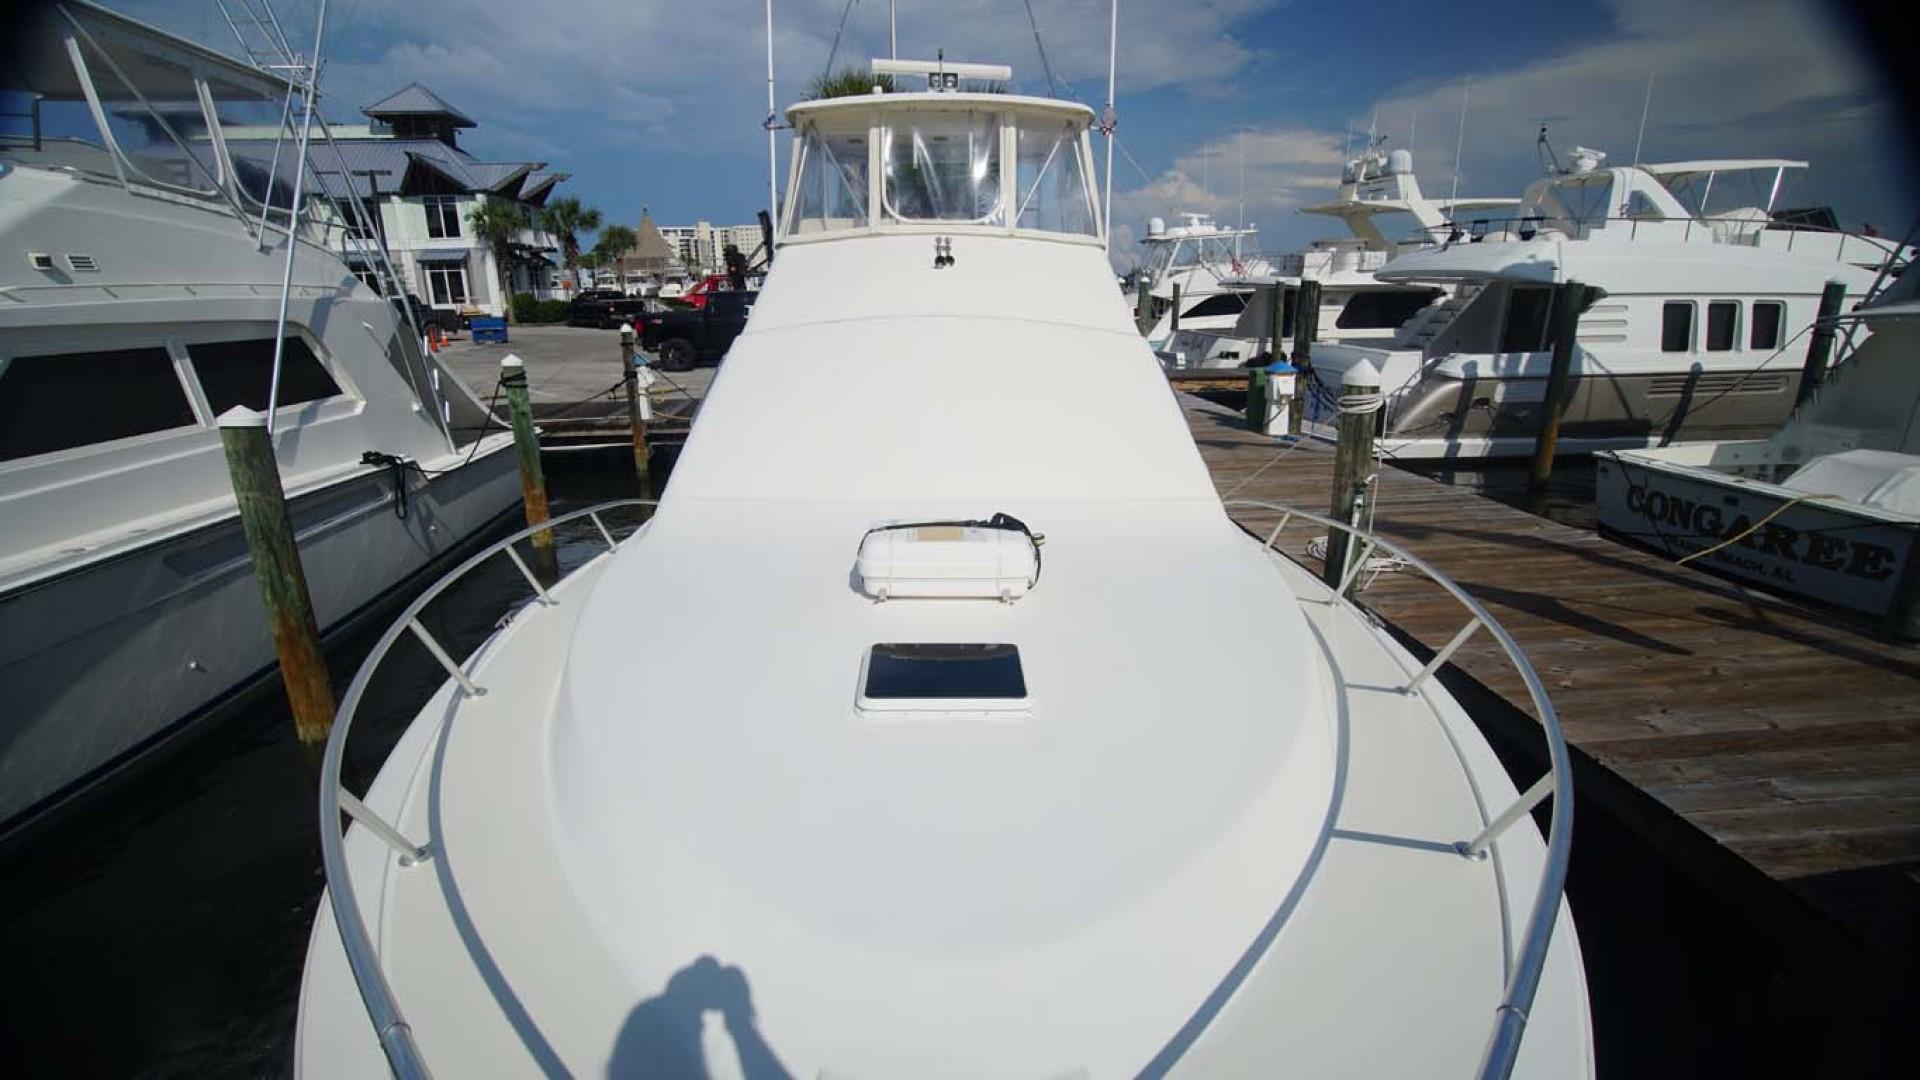 Ocean Yachts-43 Super Sport 2002-Desperado Orange Beach-Alabama-United States-Foredeck Looking Aft-1219866 | Thumbnail